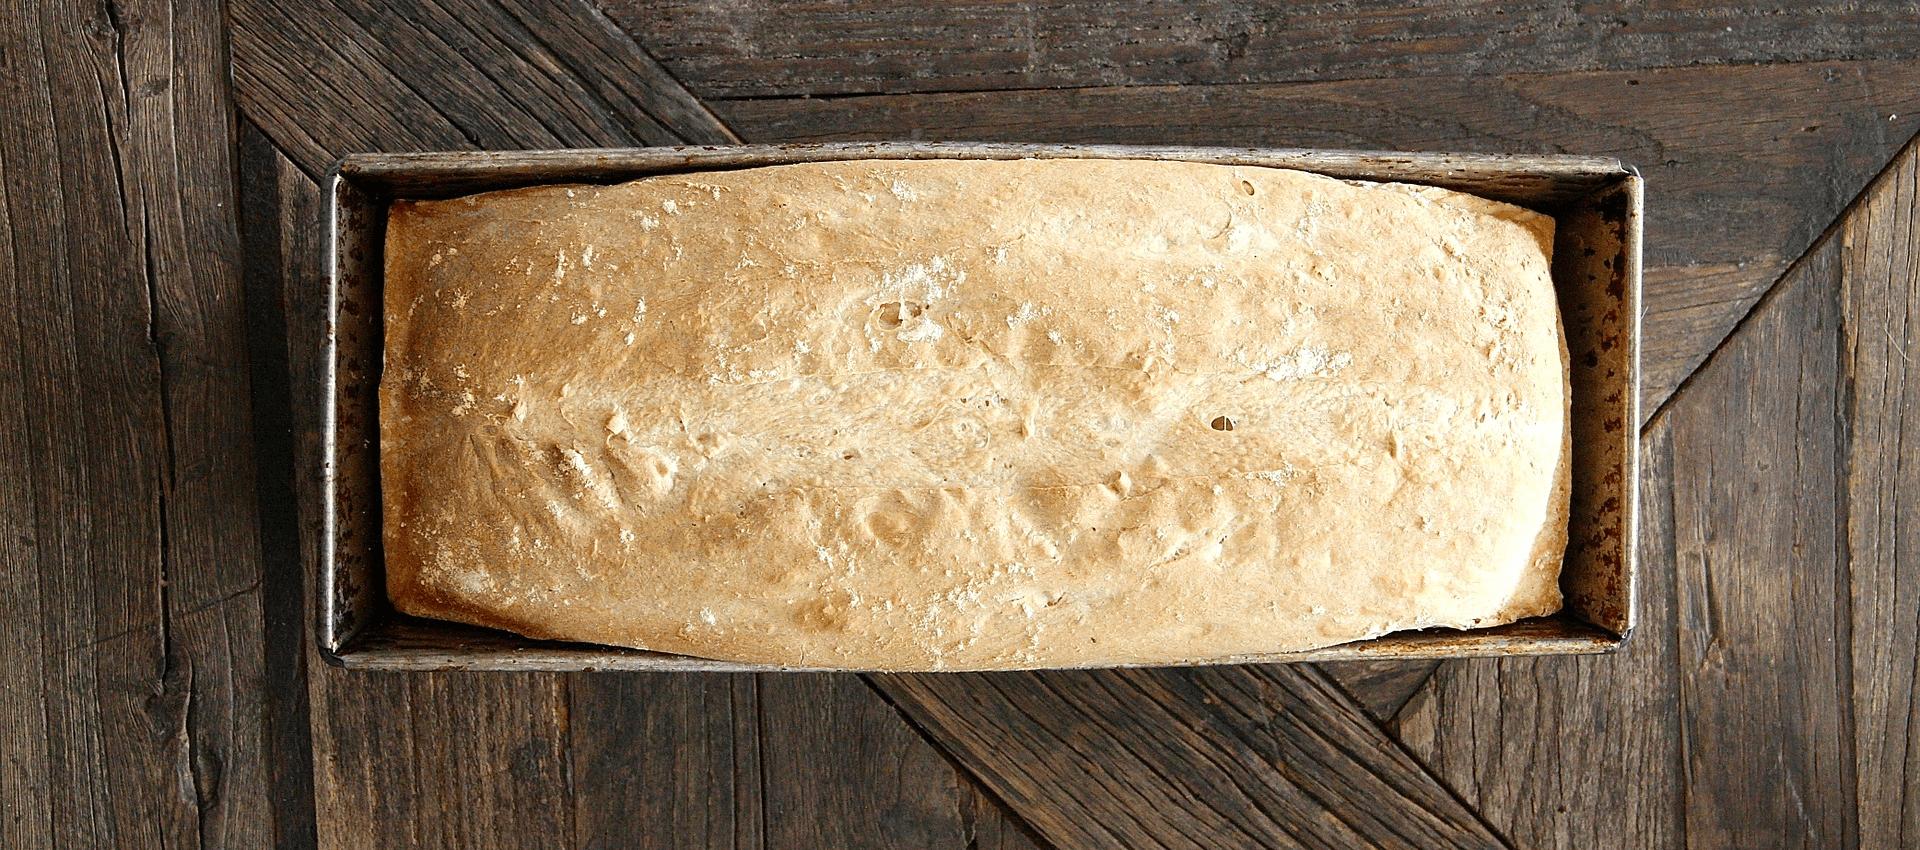 Daily Bread Consultancy